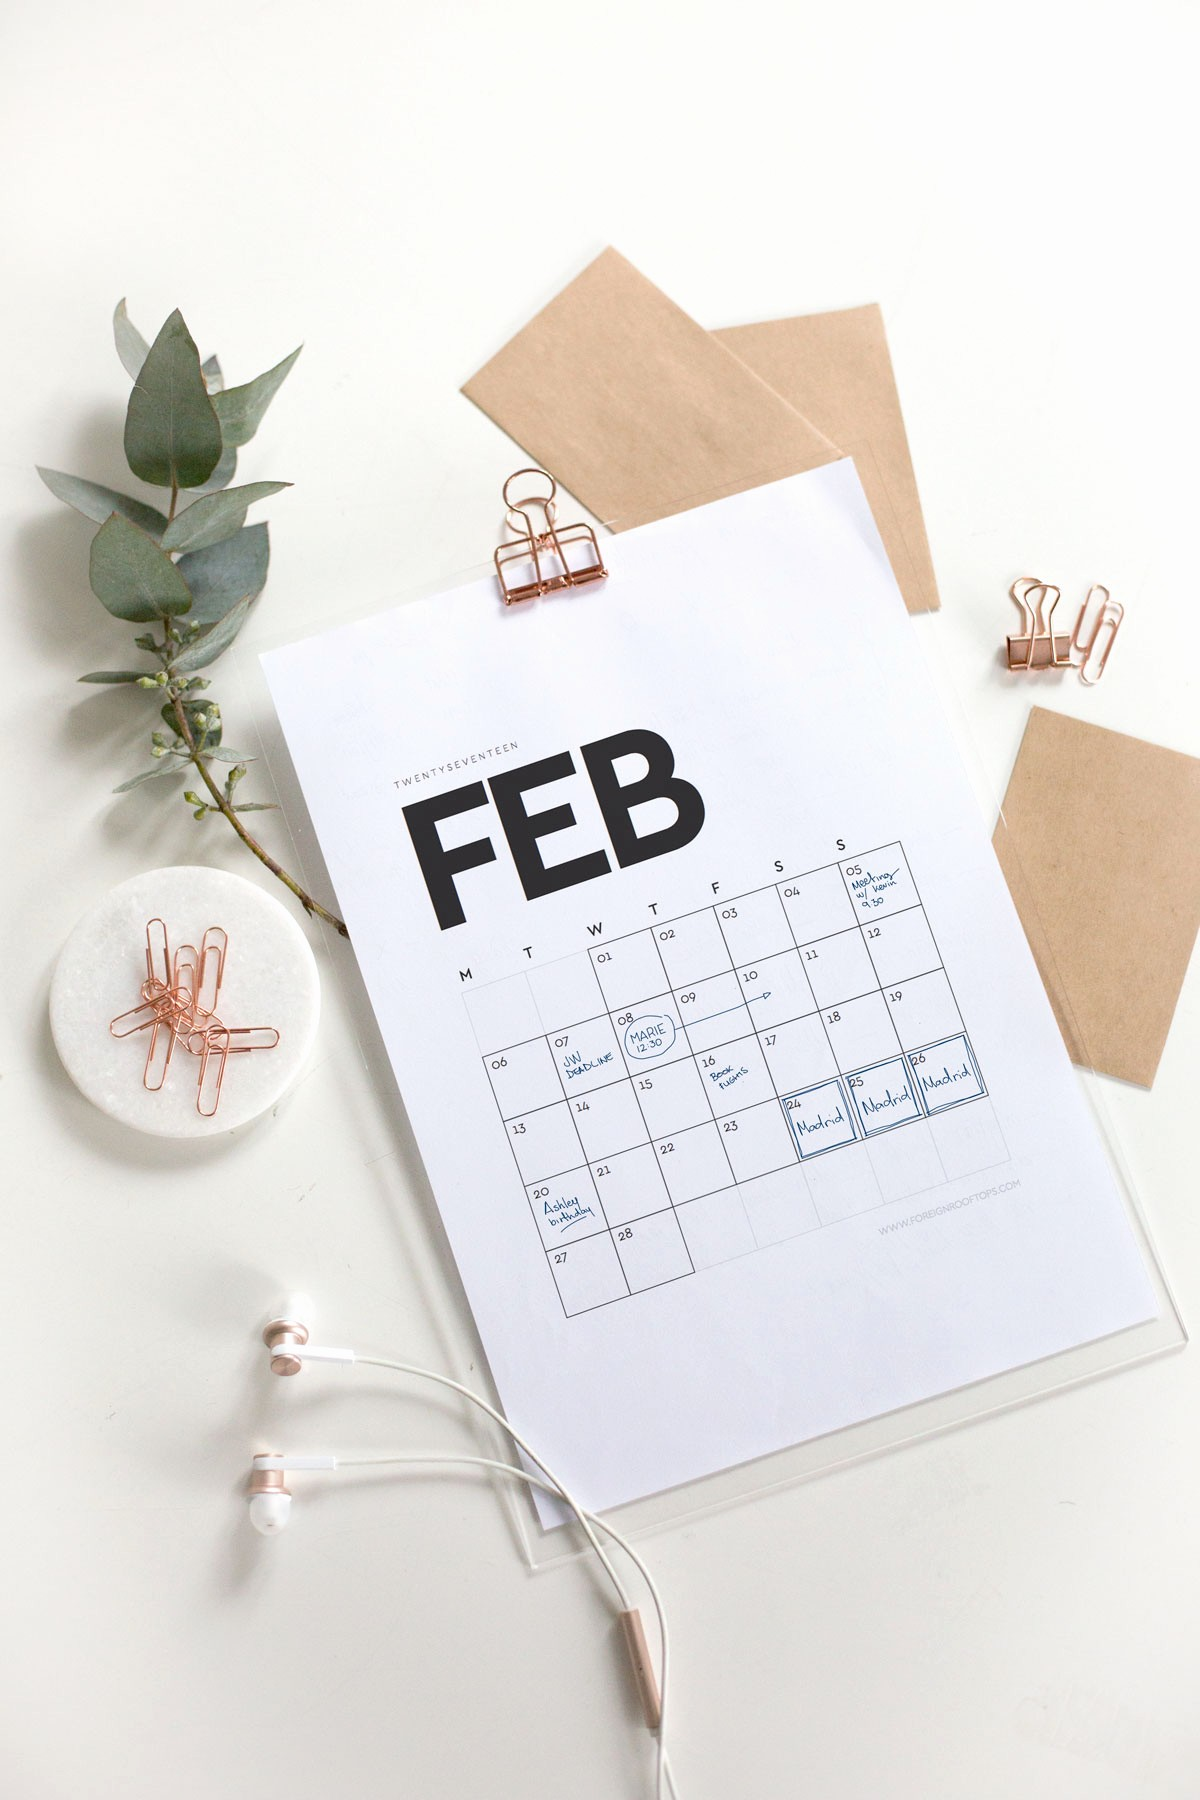 Free Download Of 2017 Calendar Fresh Printable Wall Calendar 2017 Free Download